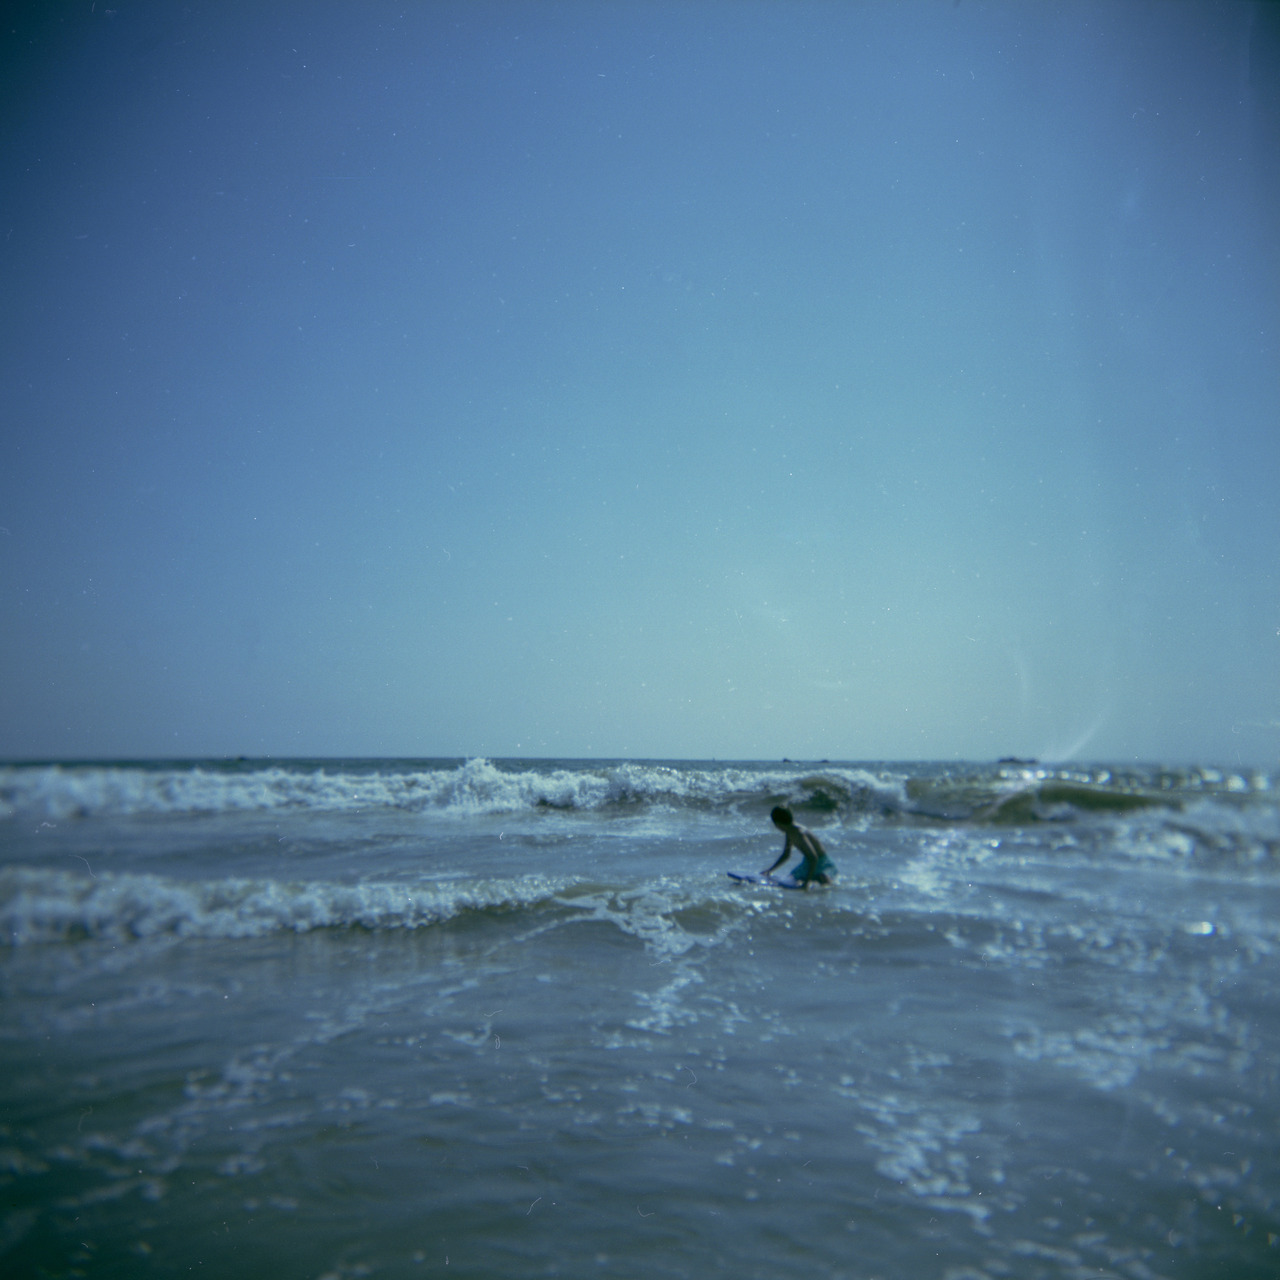 Xander surfing in Santa Monica.   August, 2012   Holga, Fuji Reala